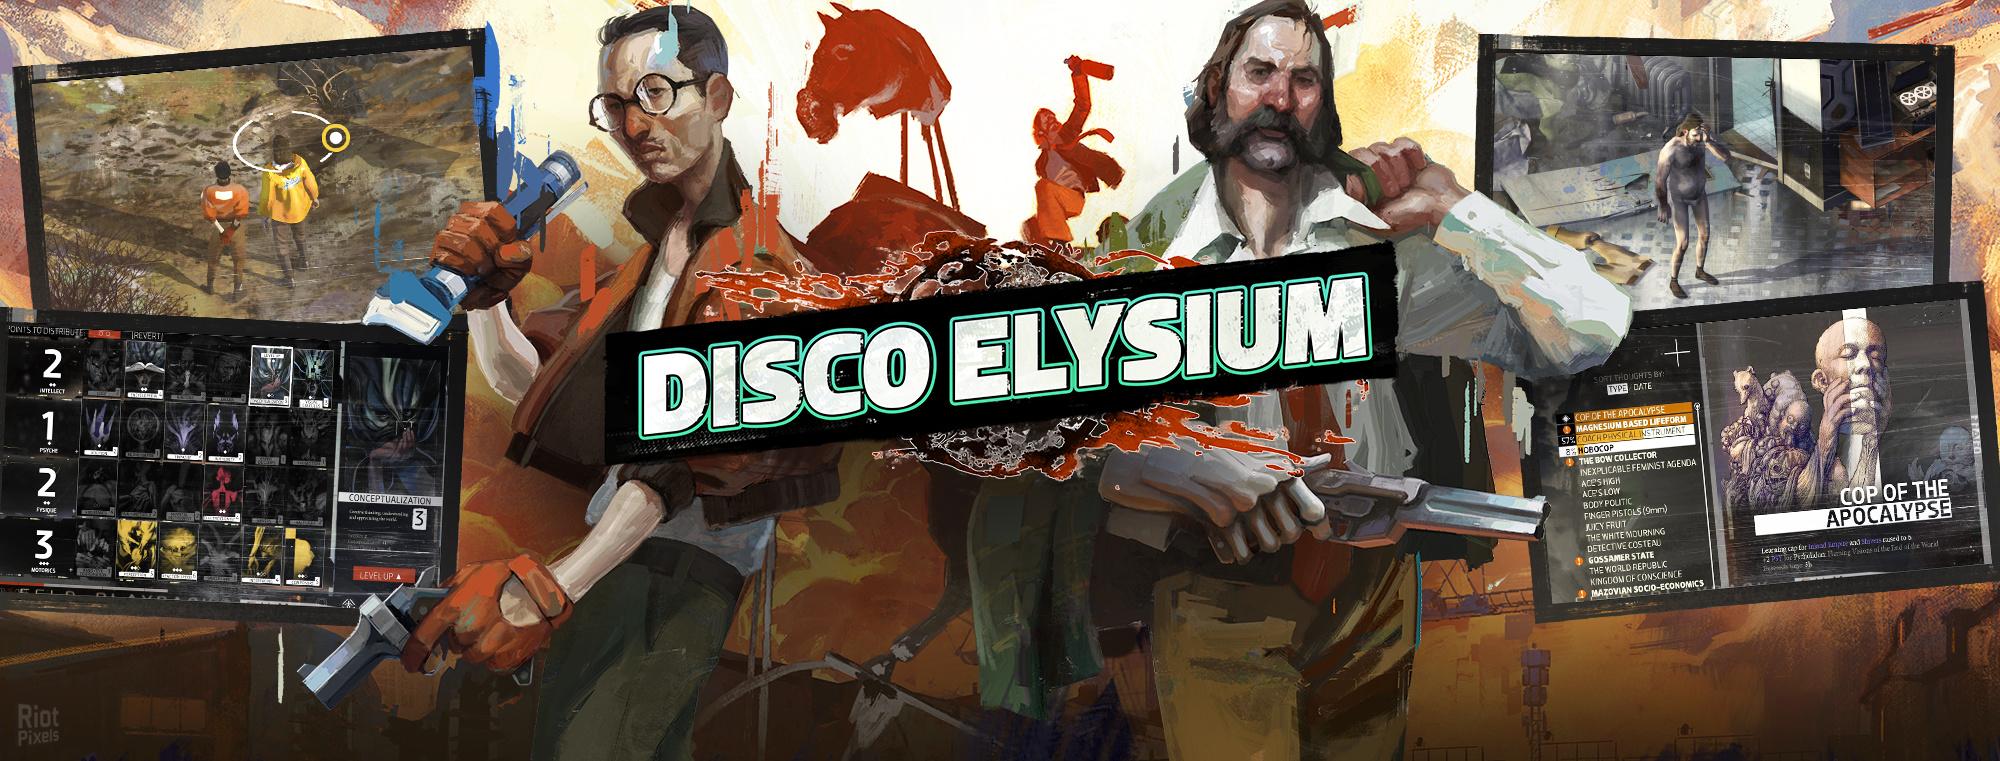 artwork.disco-elysium.2000x761.2019-10-15.110.jpg